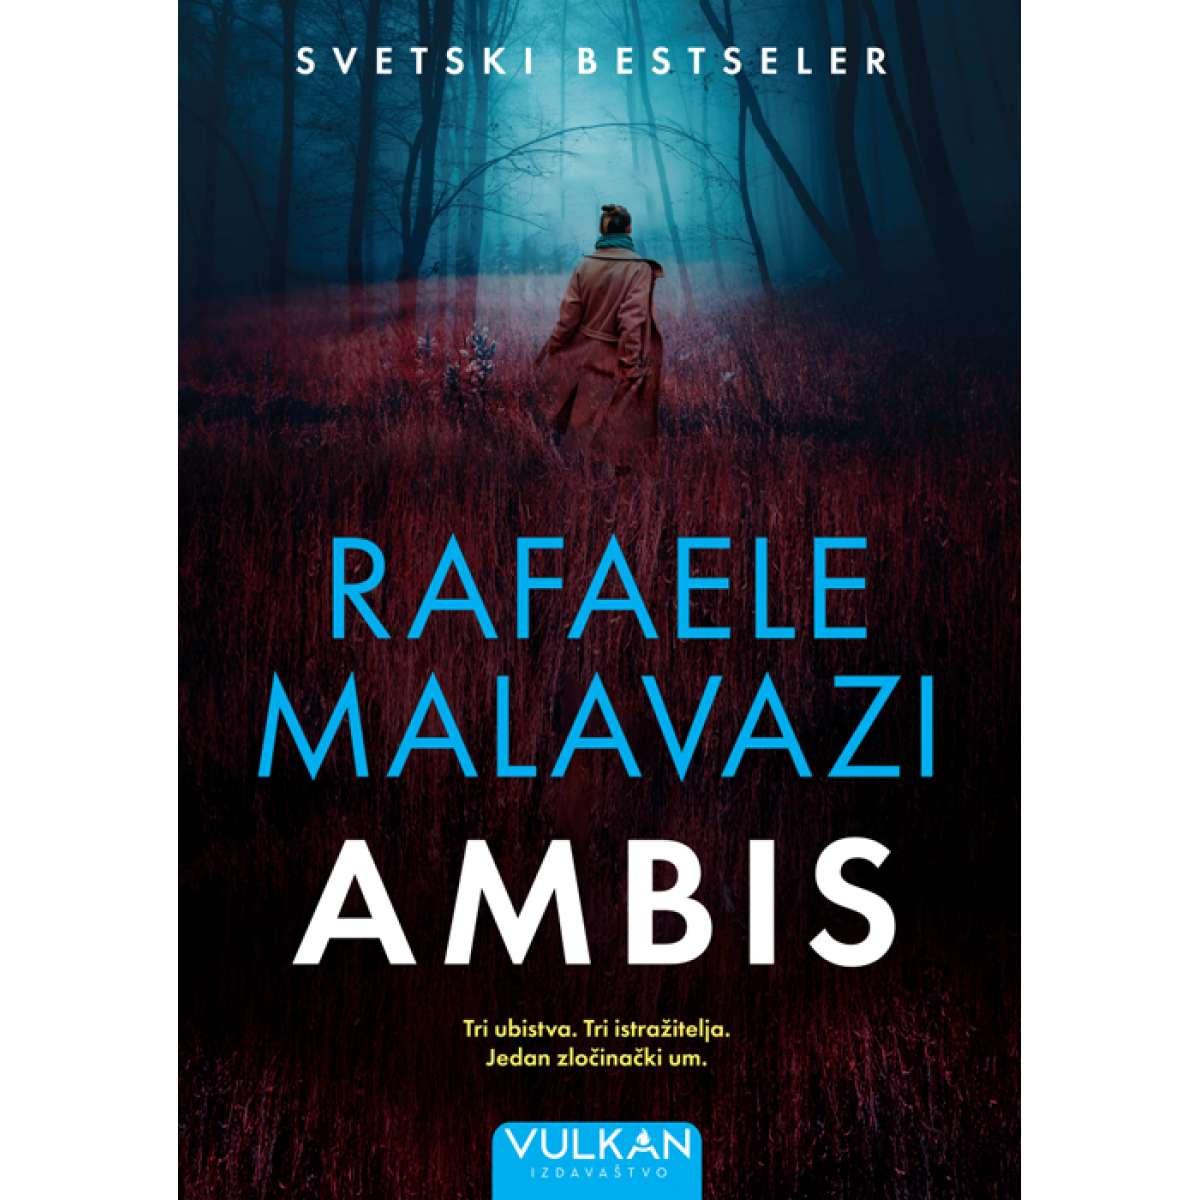 AMBIS